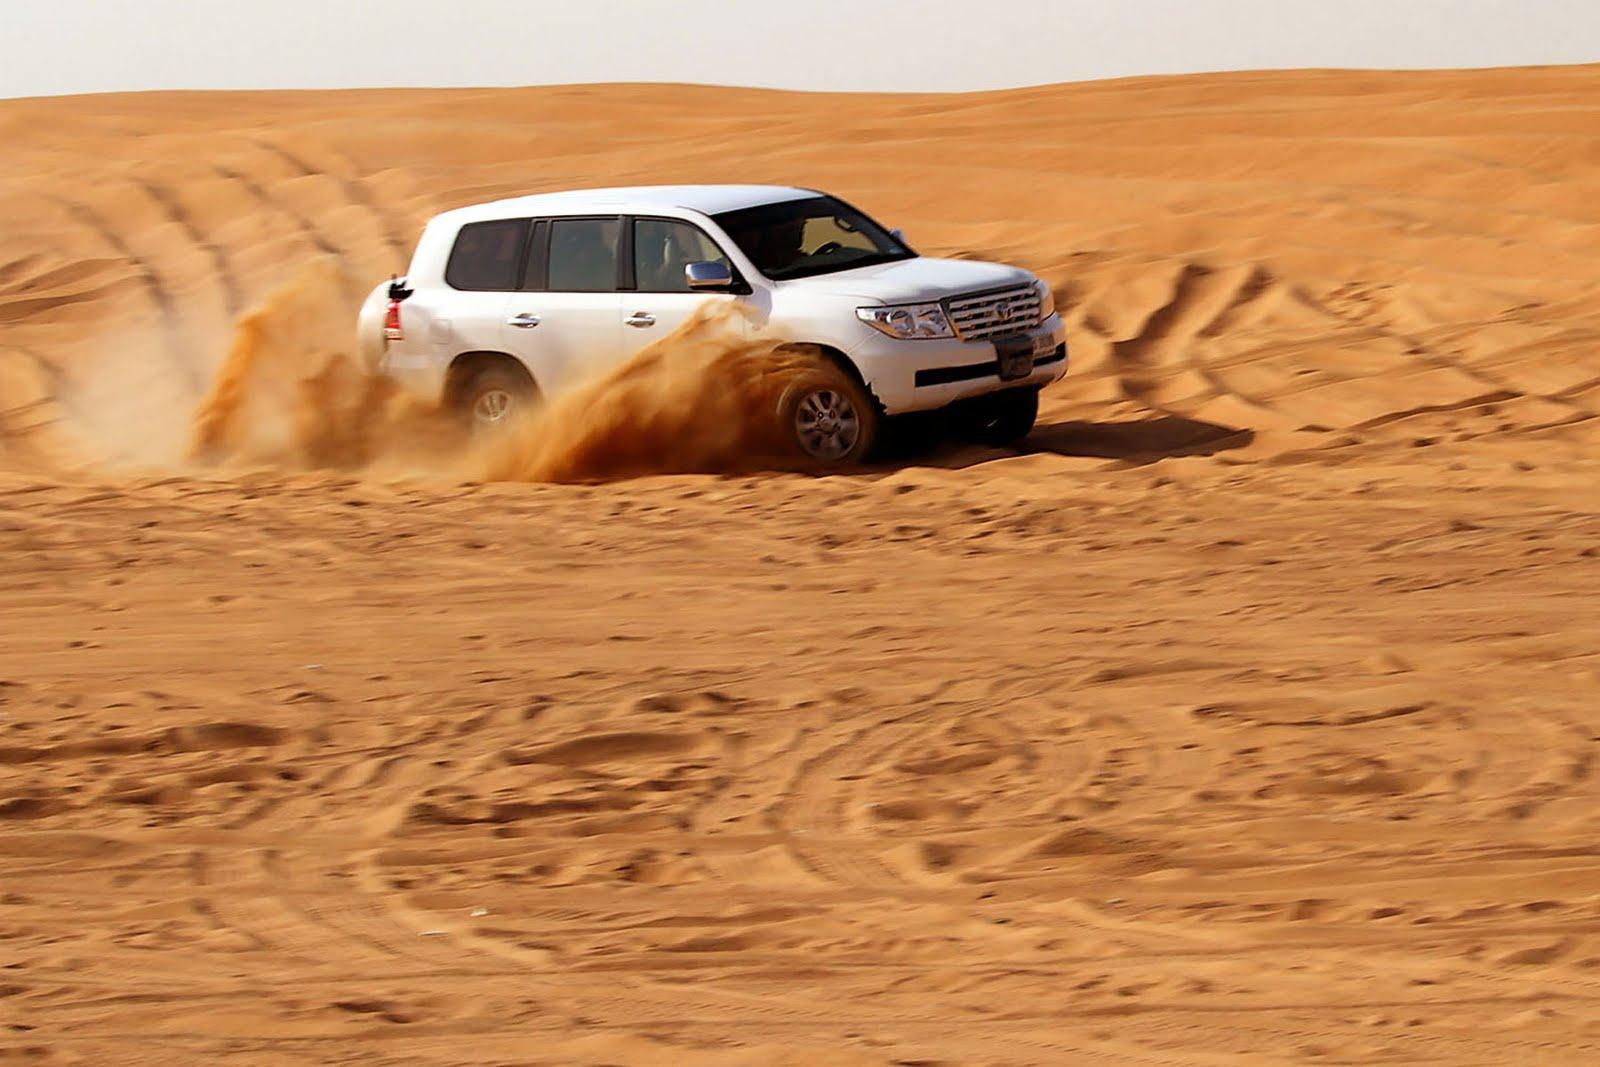 Desert Safaris